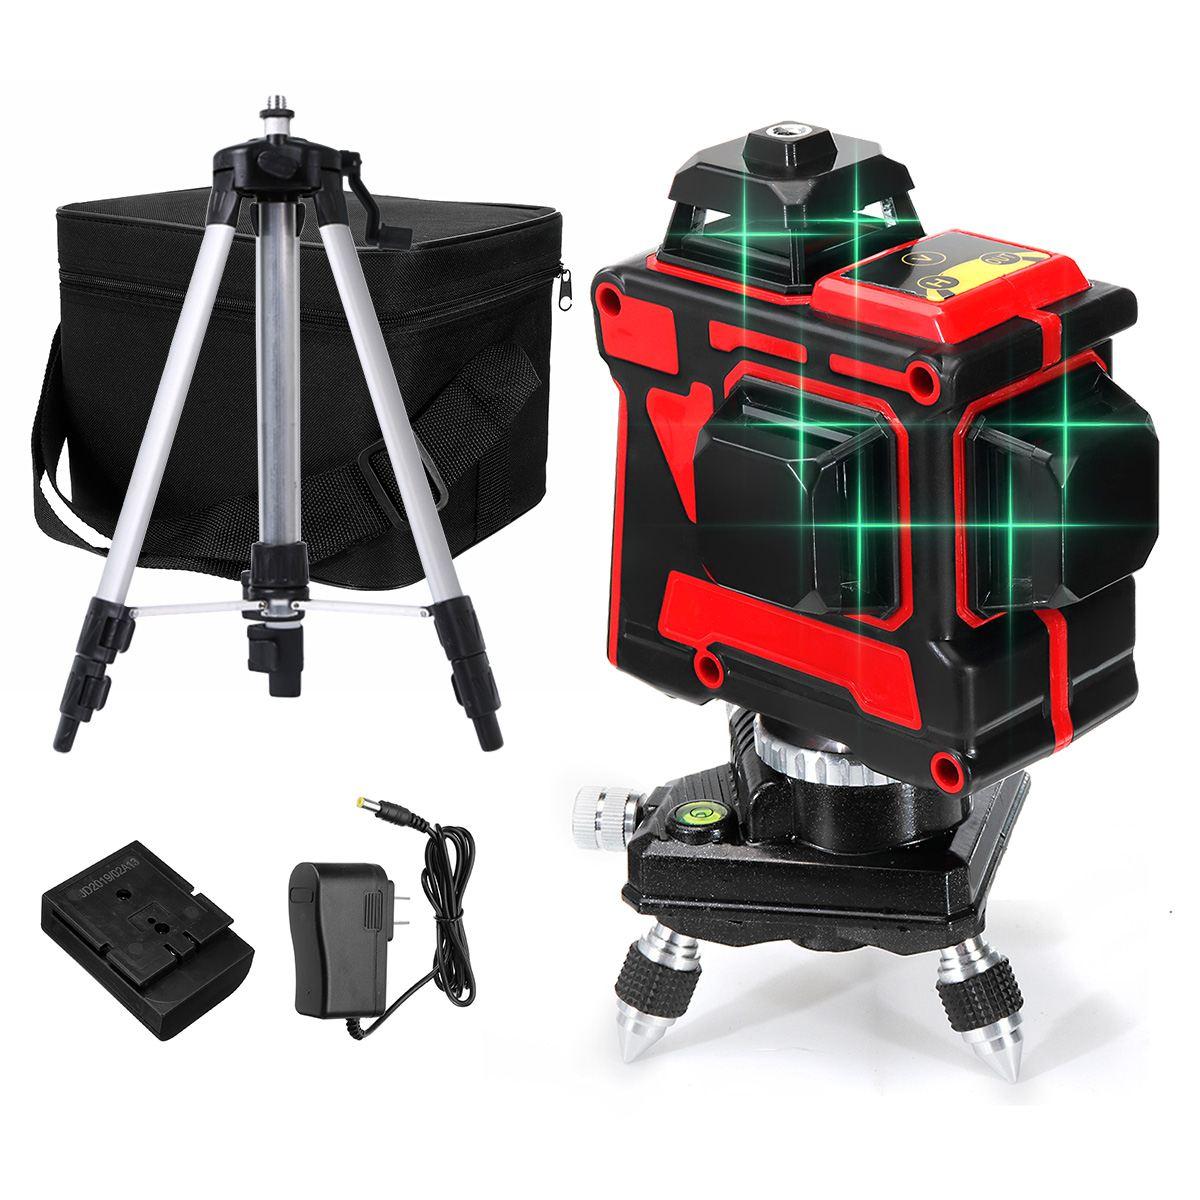 ZEAST Laser Levels High-precision 12 Lines 3D Green Laser Self Leveling 360 Degree Horizontal & Vertical Cross Waterproof